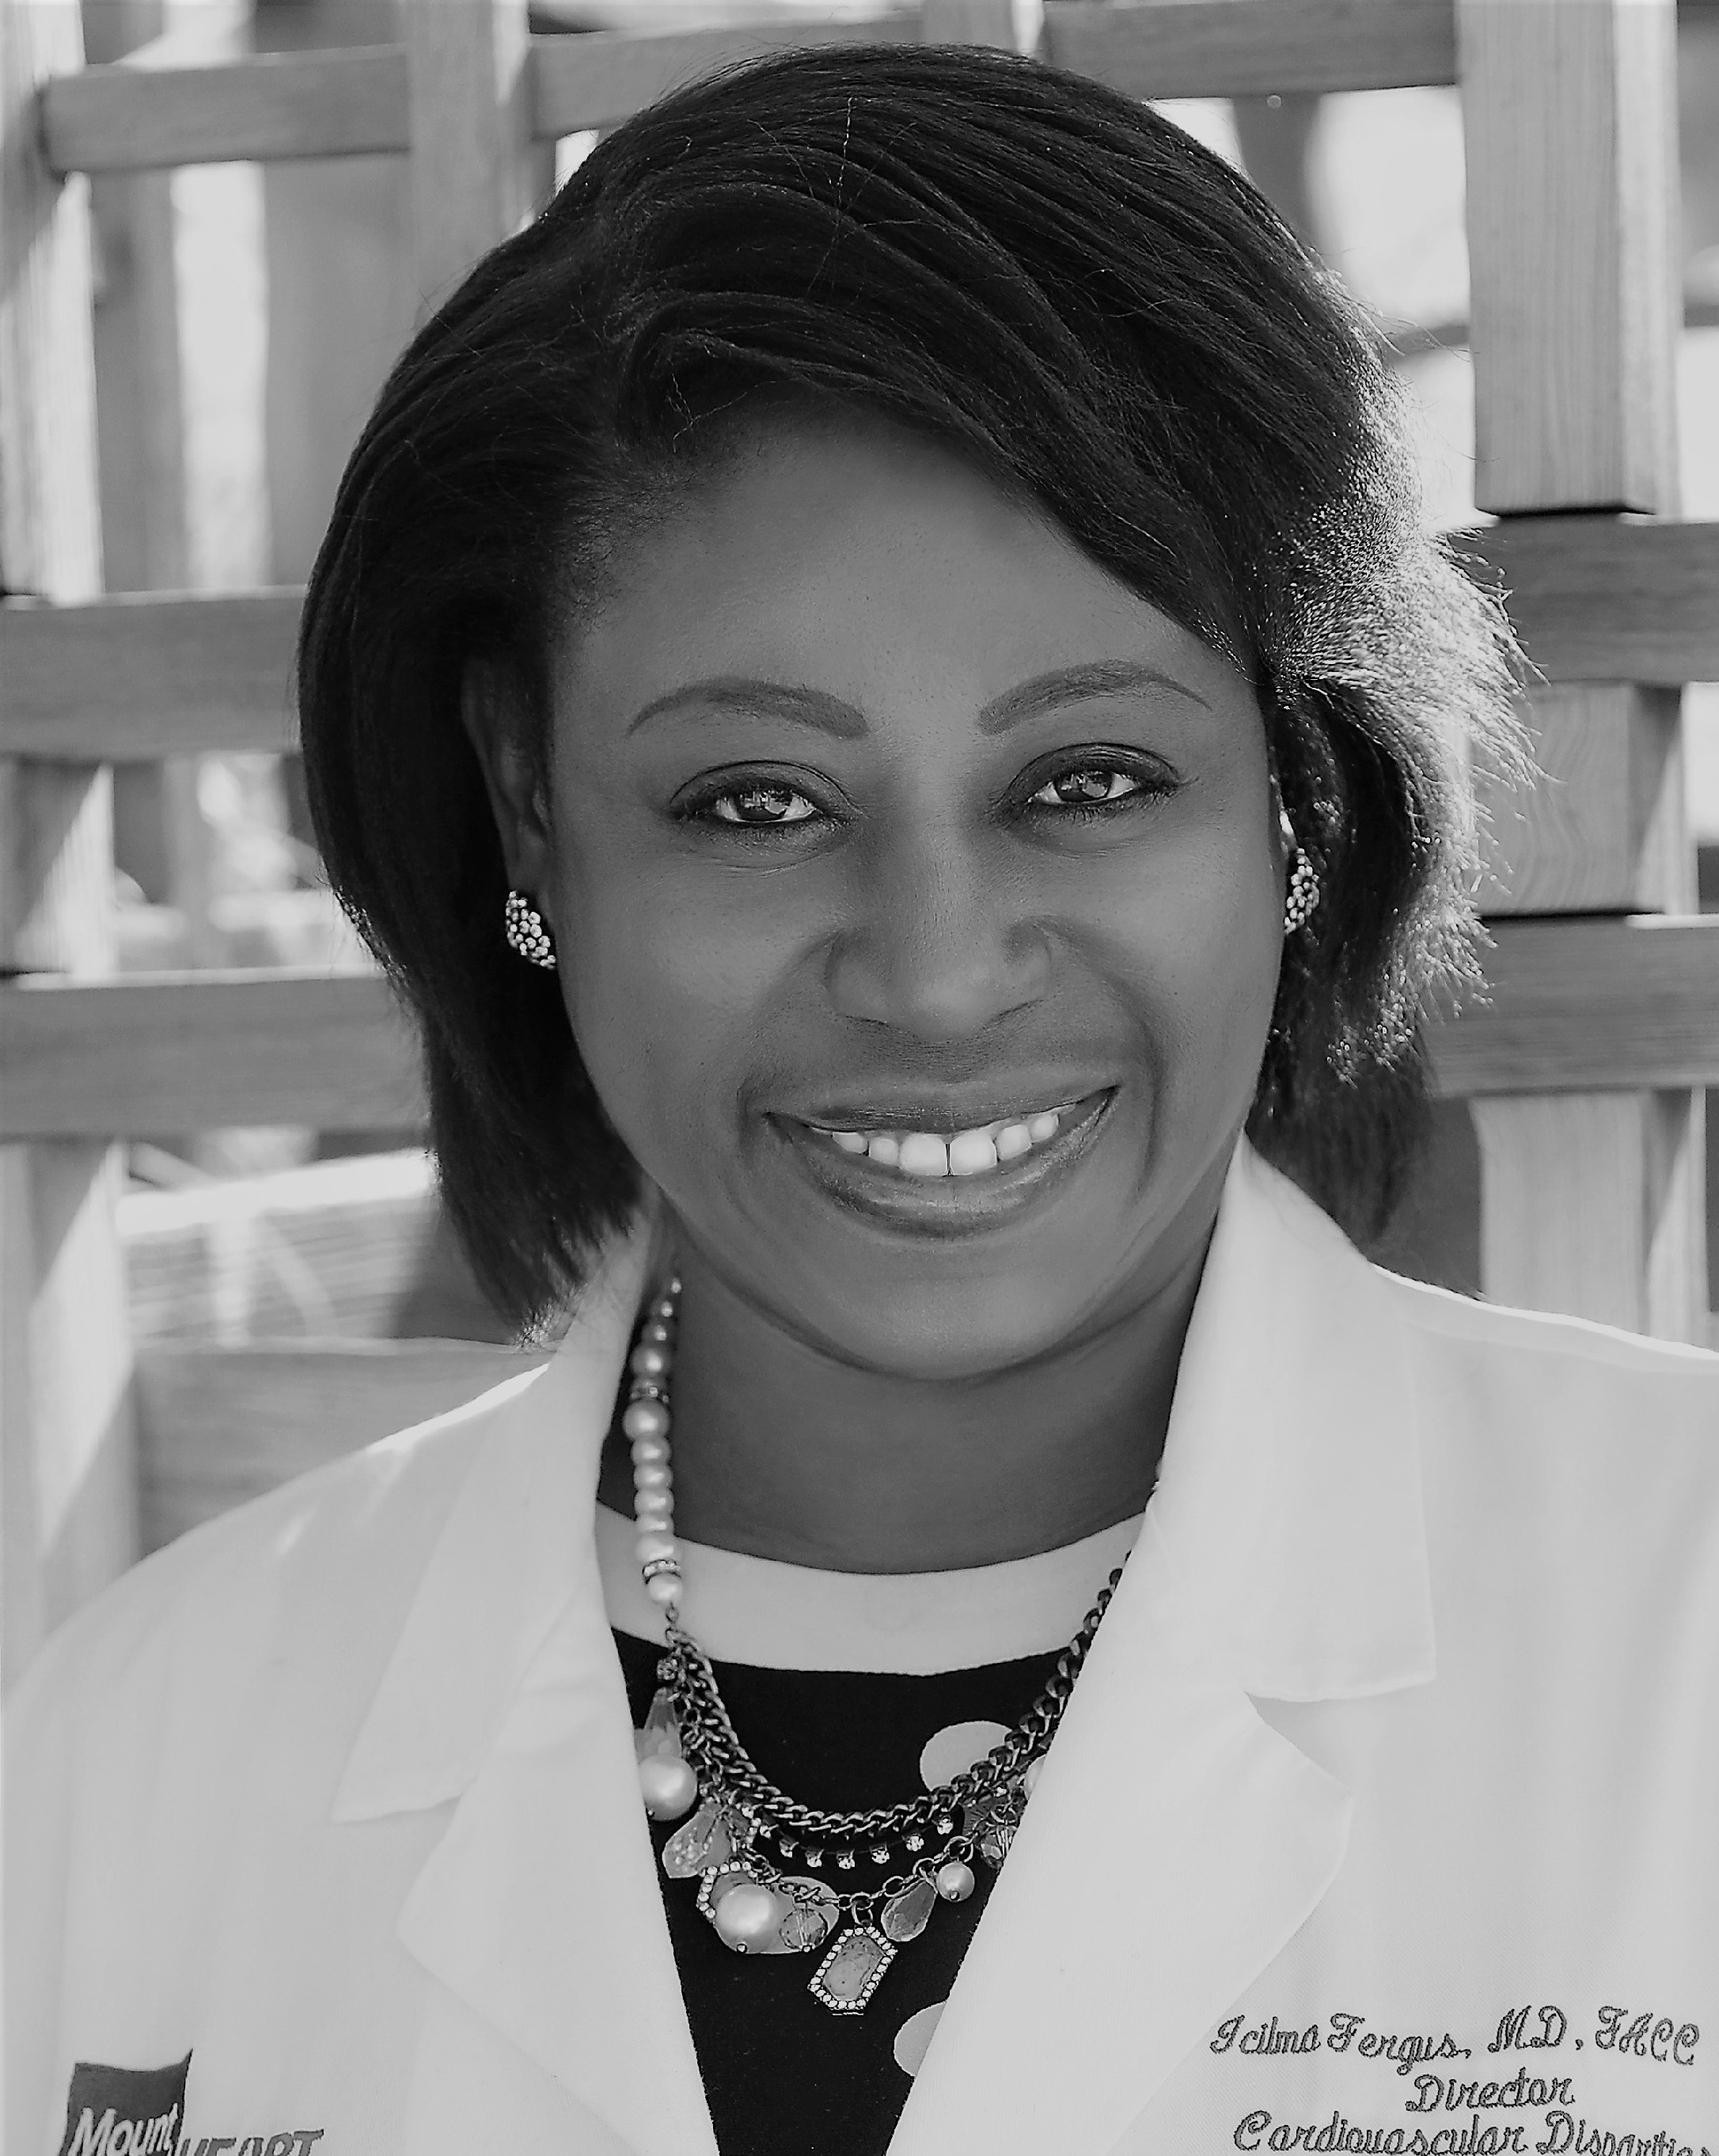 Dr. Icilma Fergus-Rowe